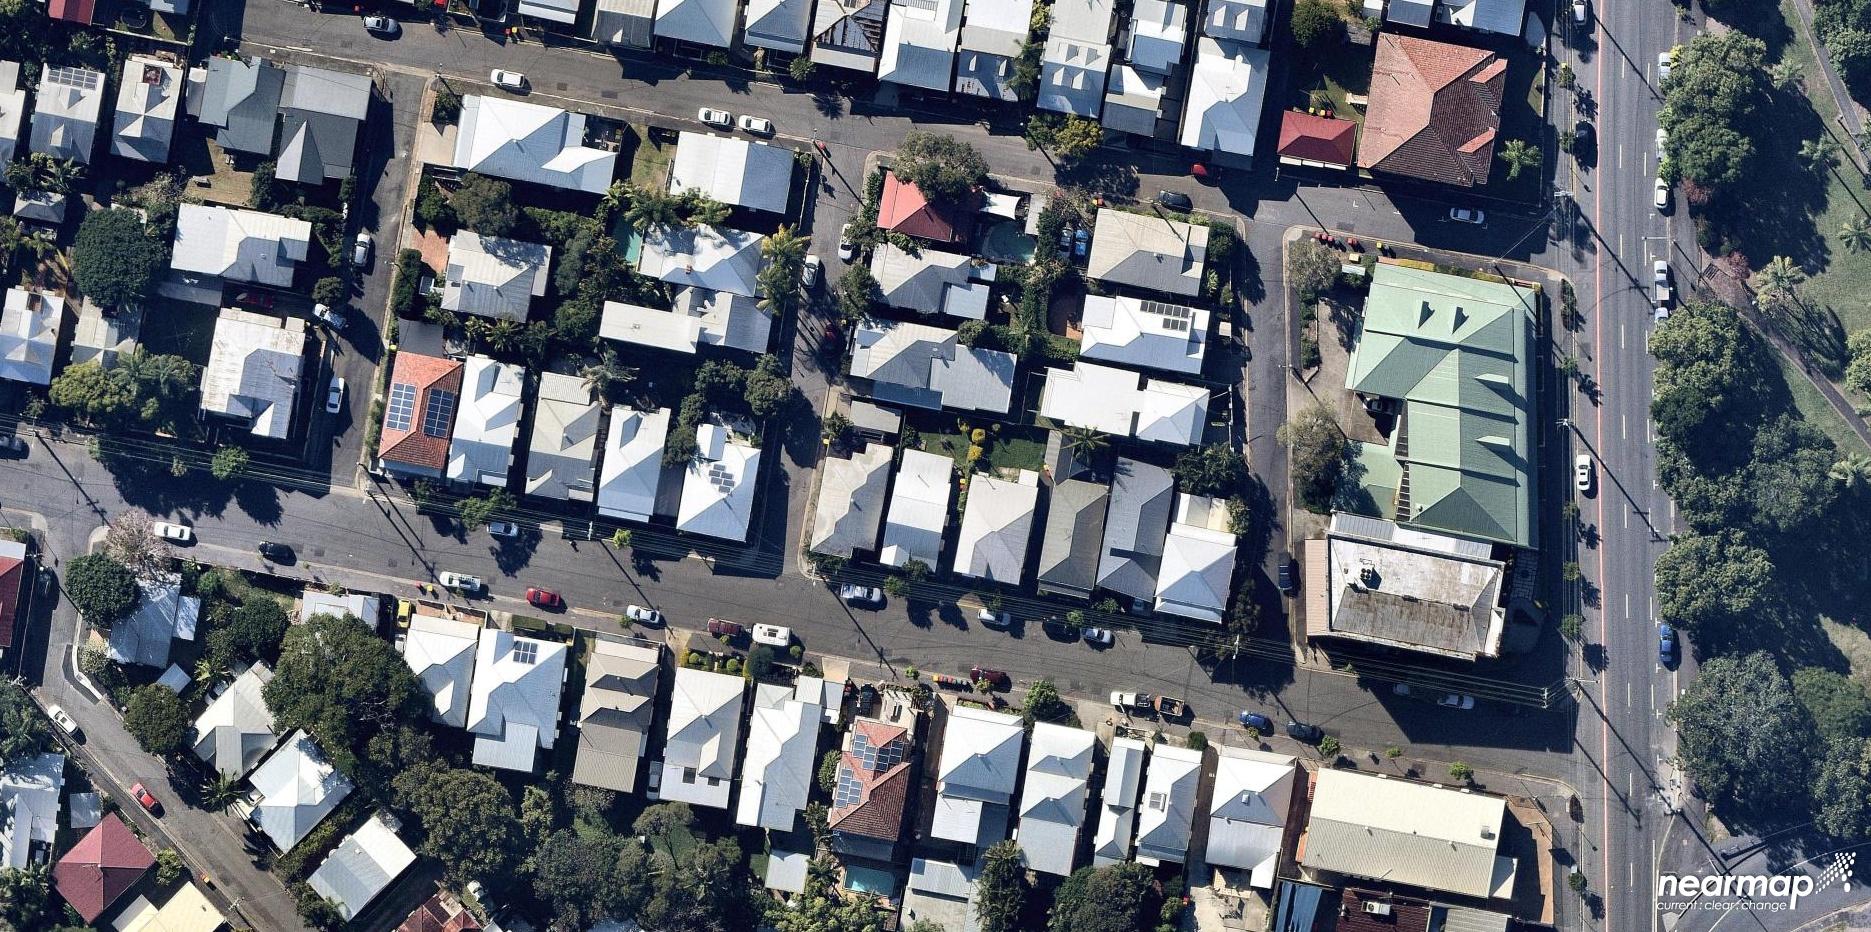 Figure 2 - Typical House densities in 2018 in Brisbane